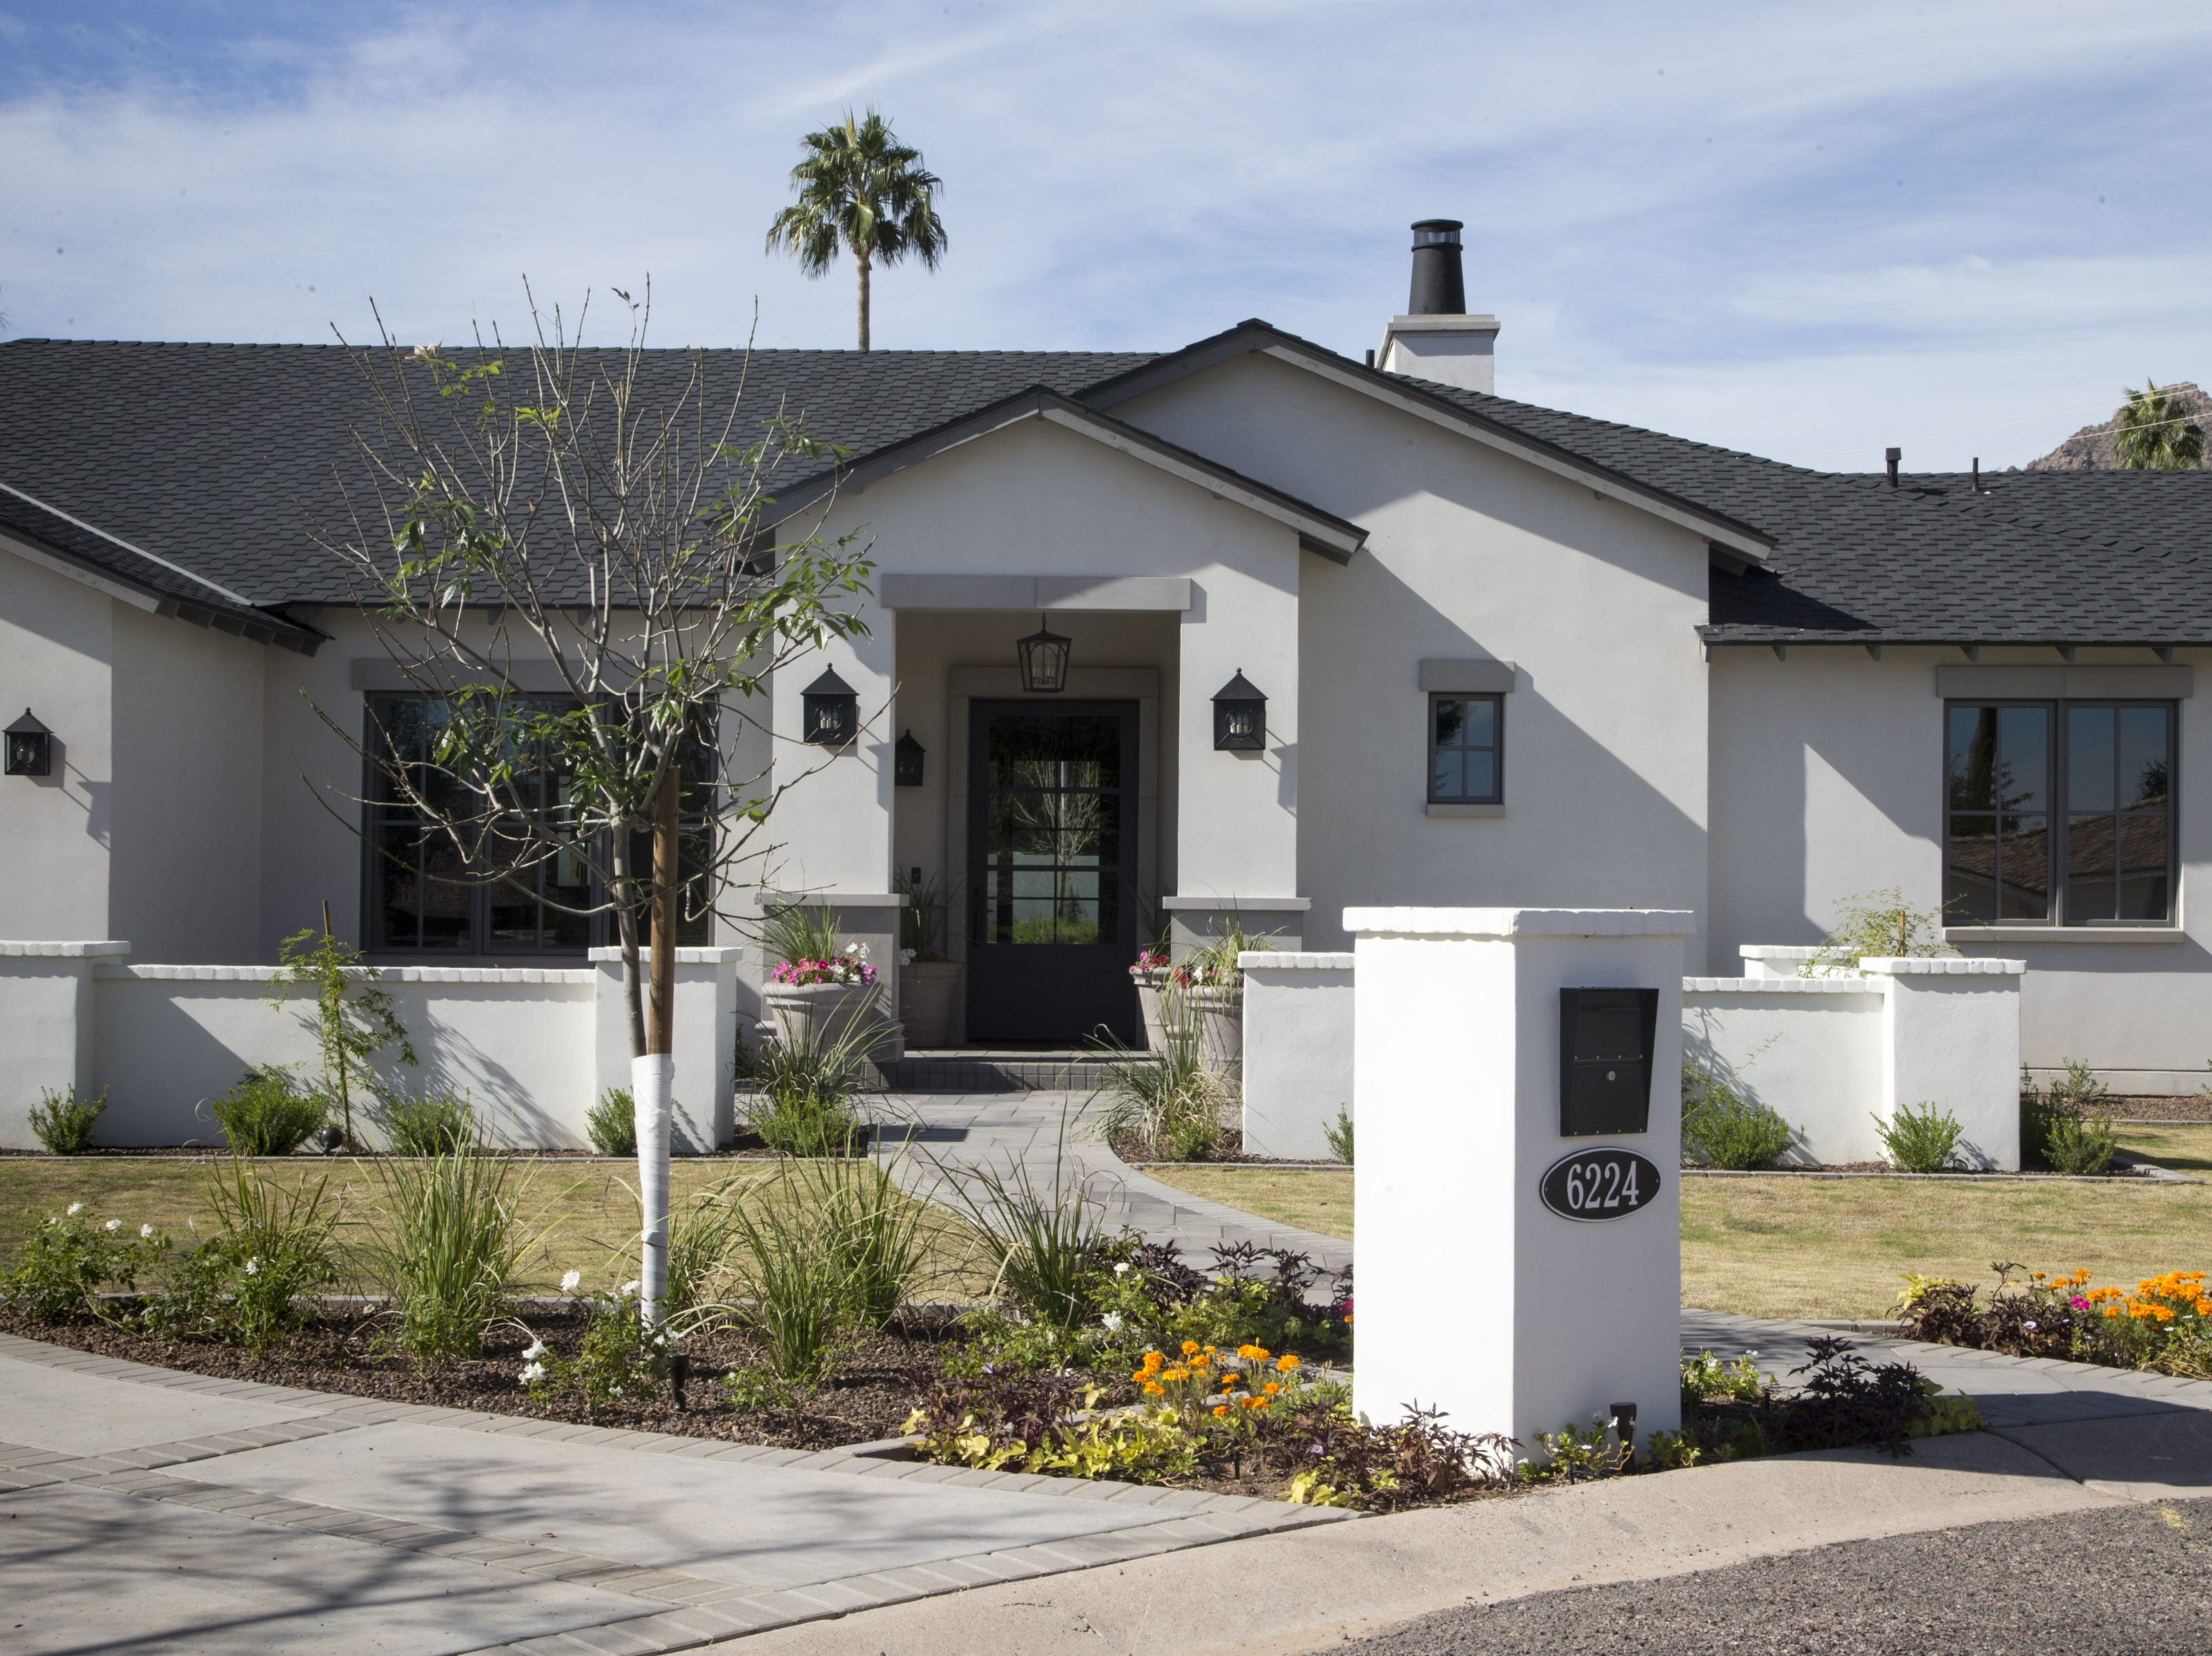 Arizona Diamondbacks third baseman Jake Lamb's new house in the Arcadia community in Scottsdale.